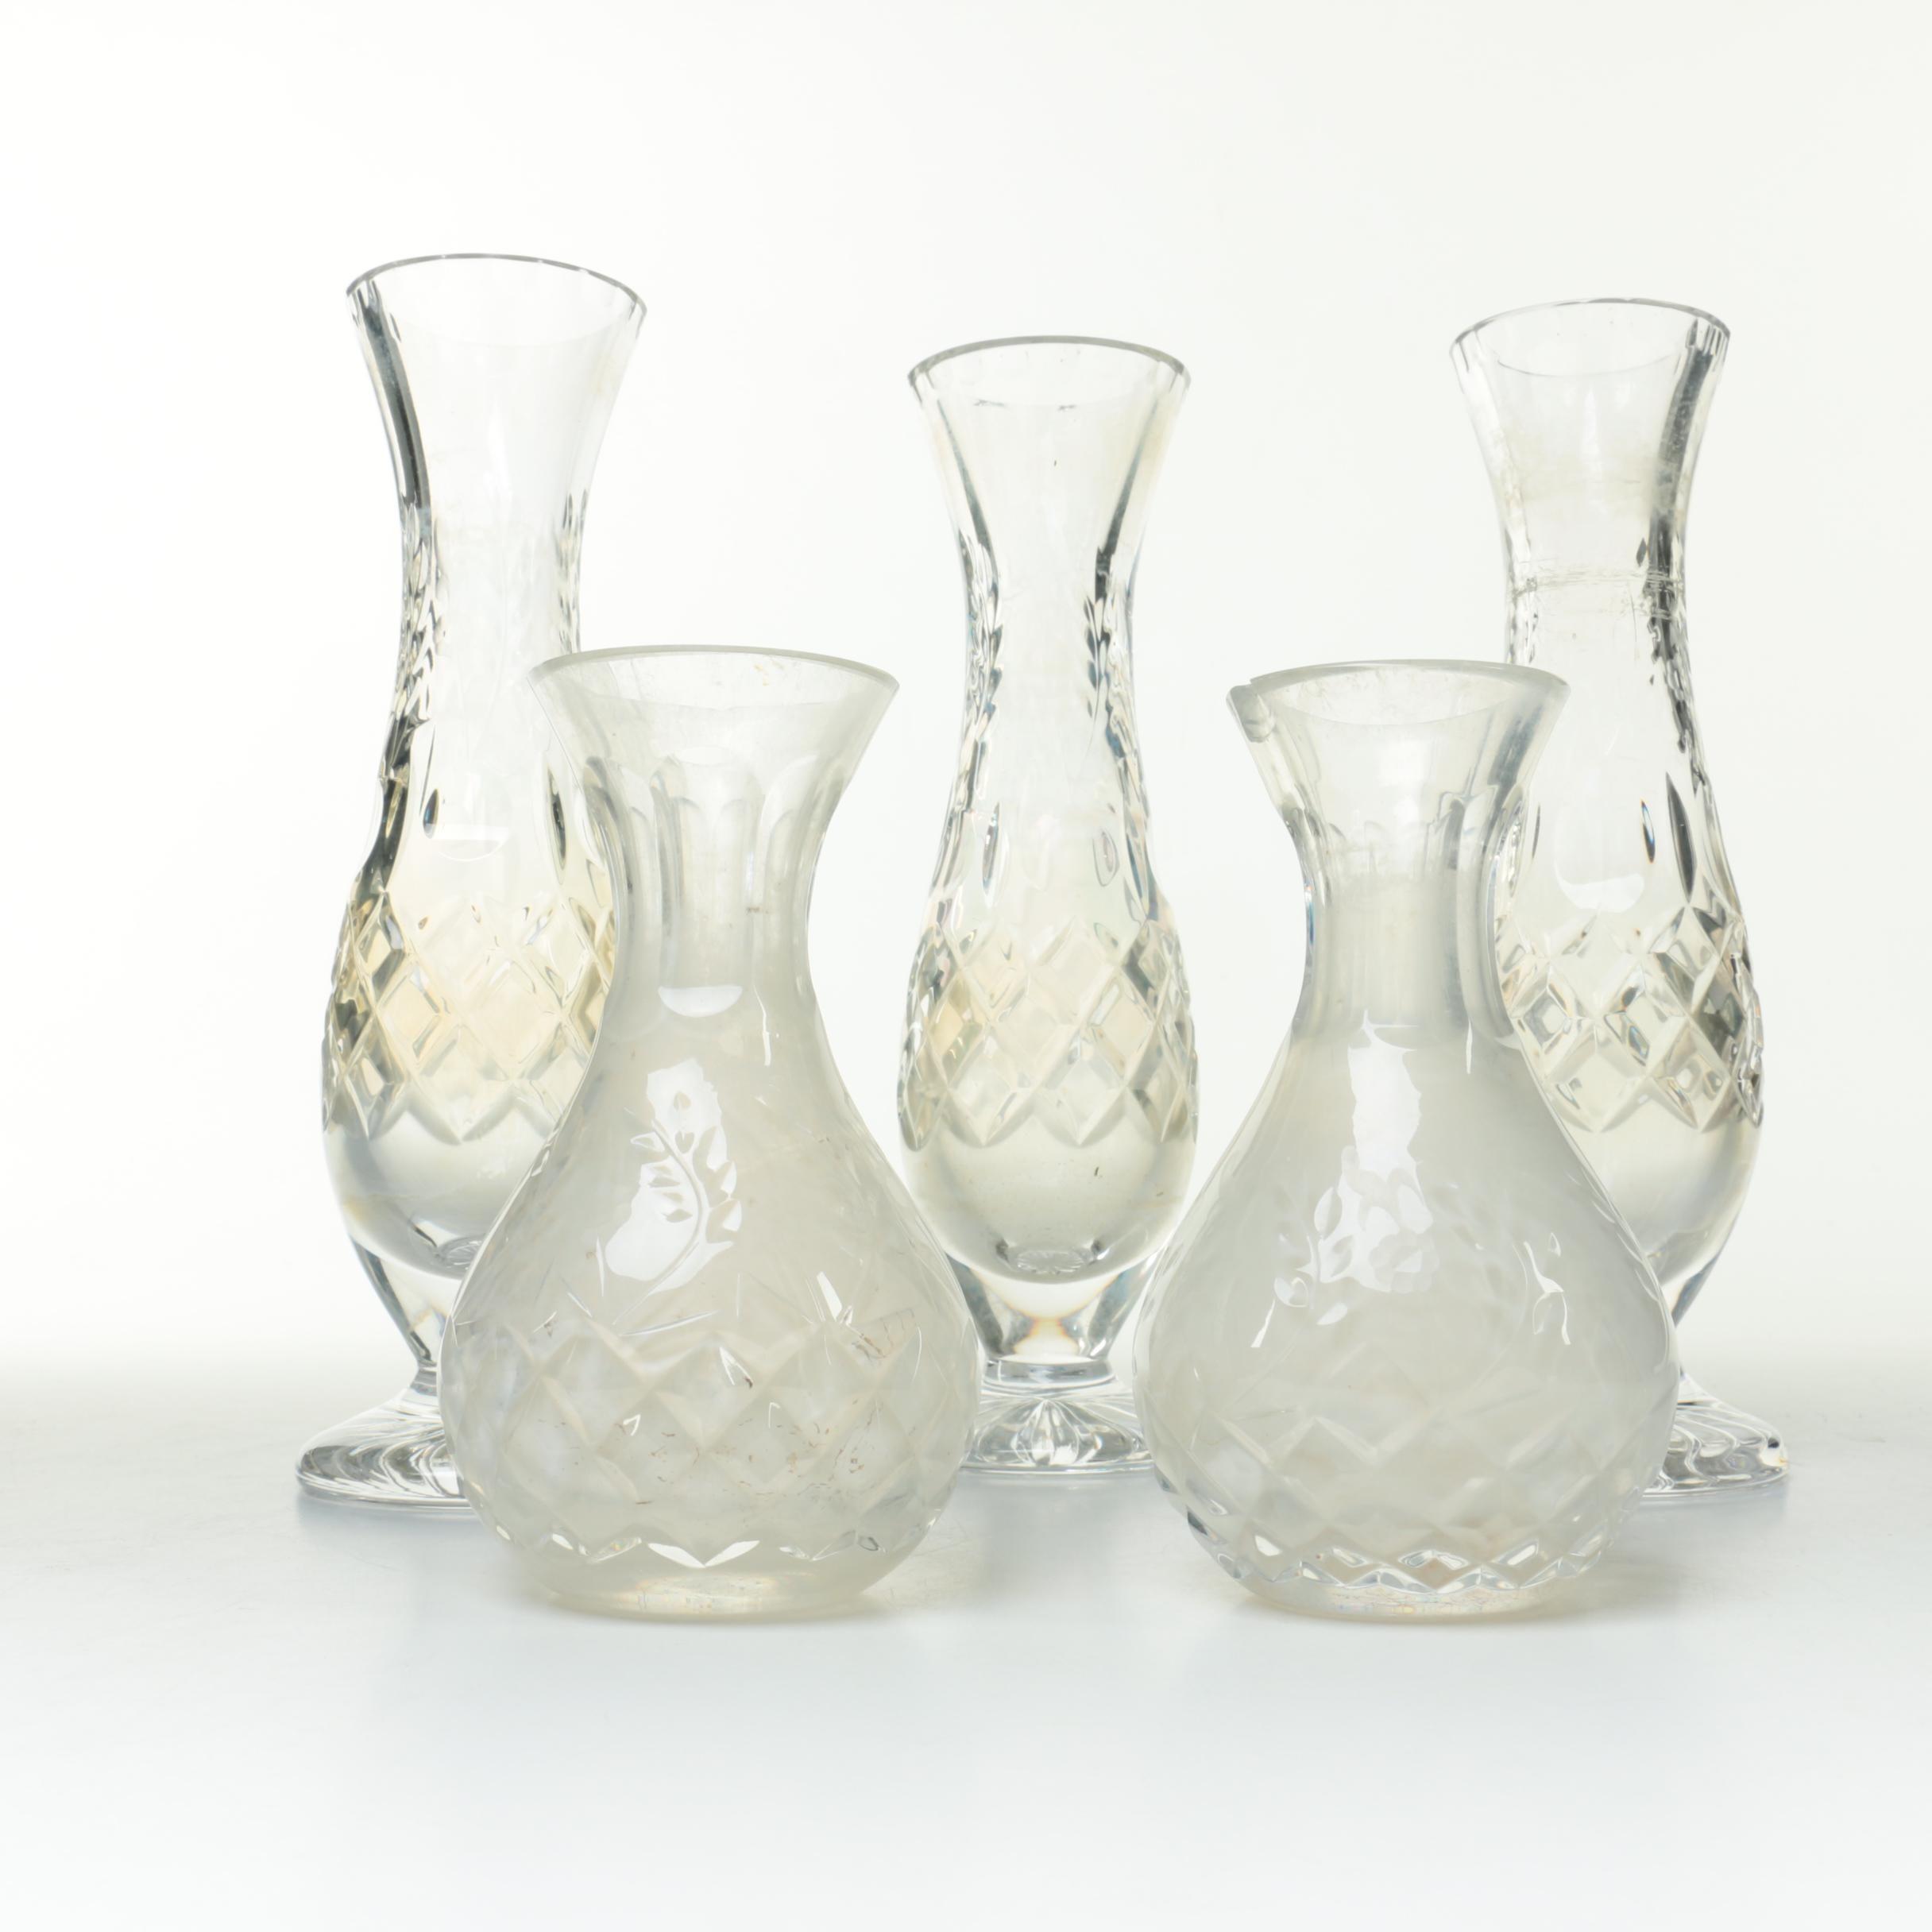 Assortment of Crystal Bud Vases